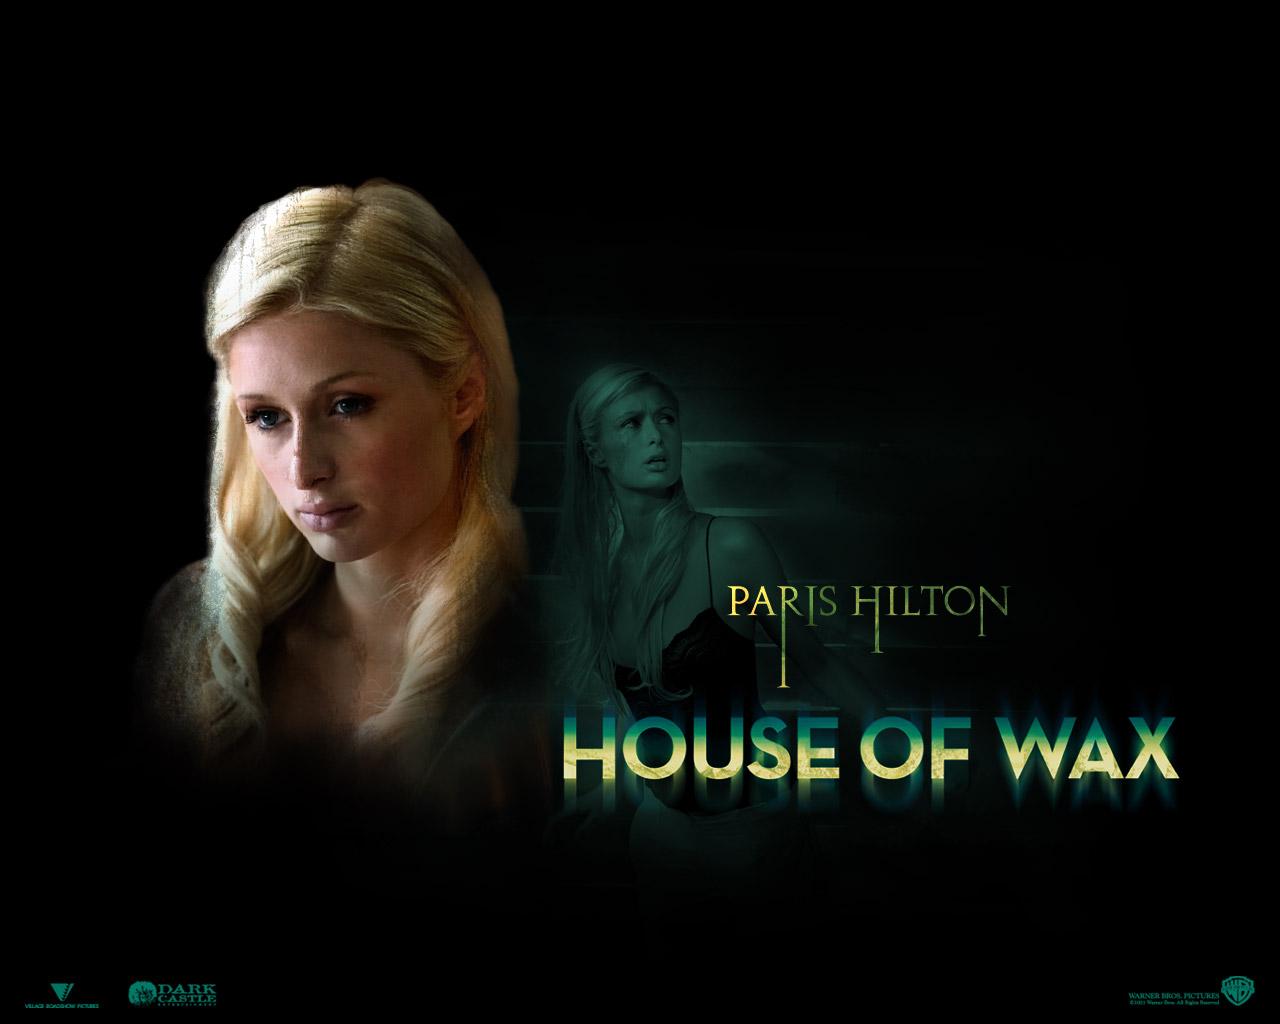 Paris Hilton In House Of Wax Wallpaper 2 1280